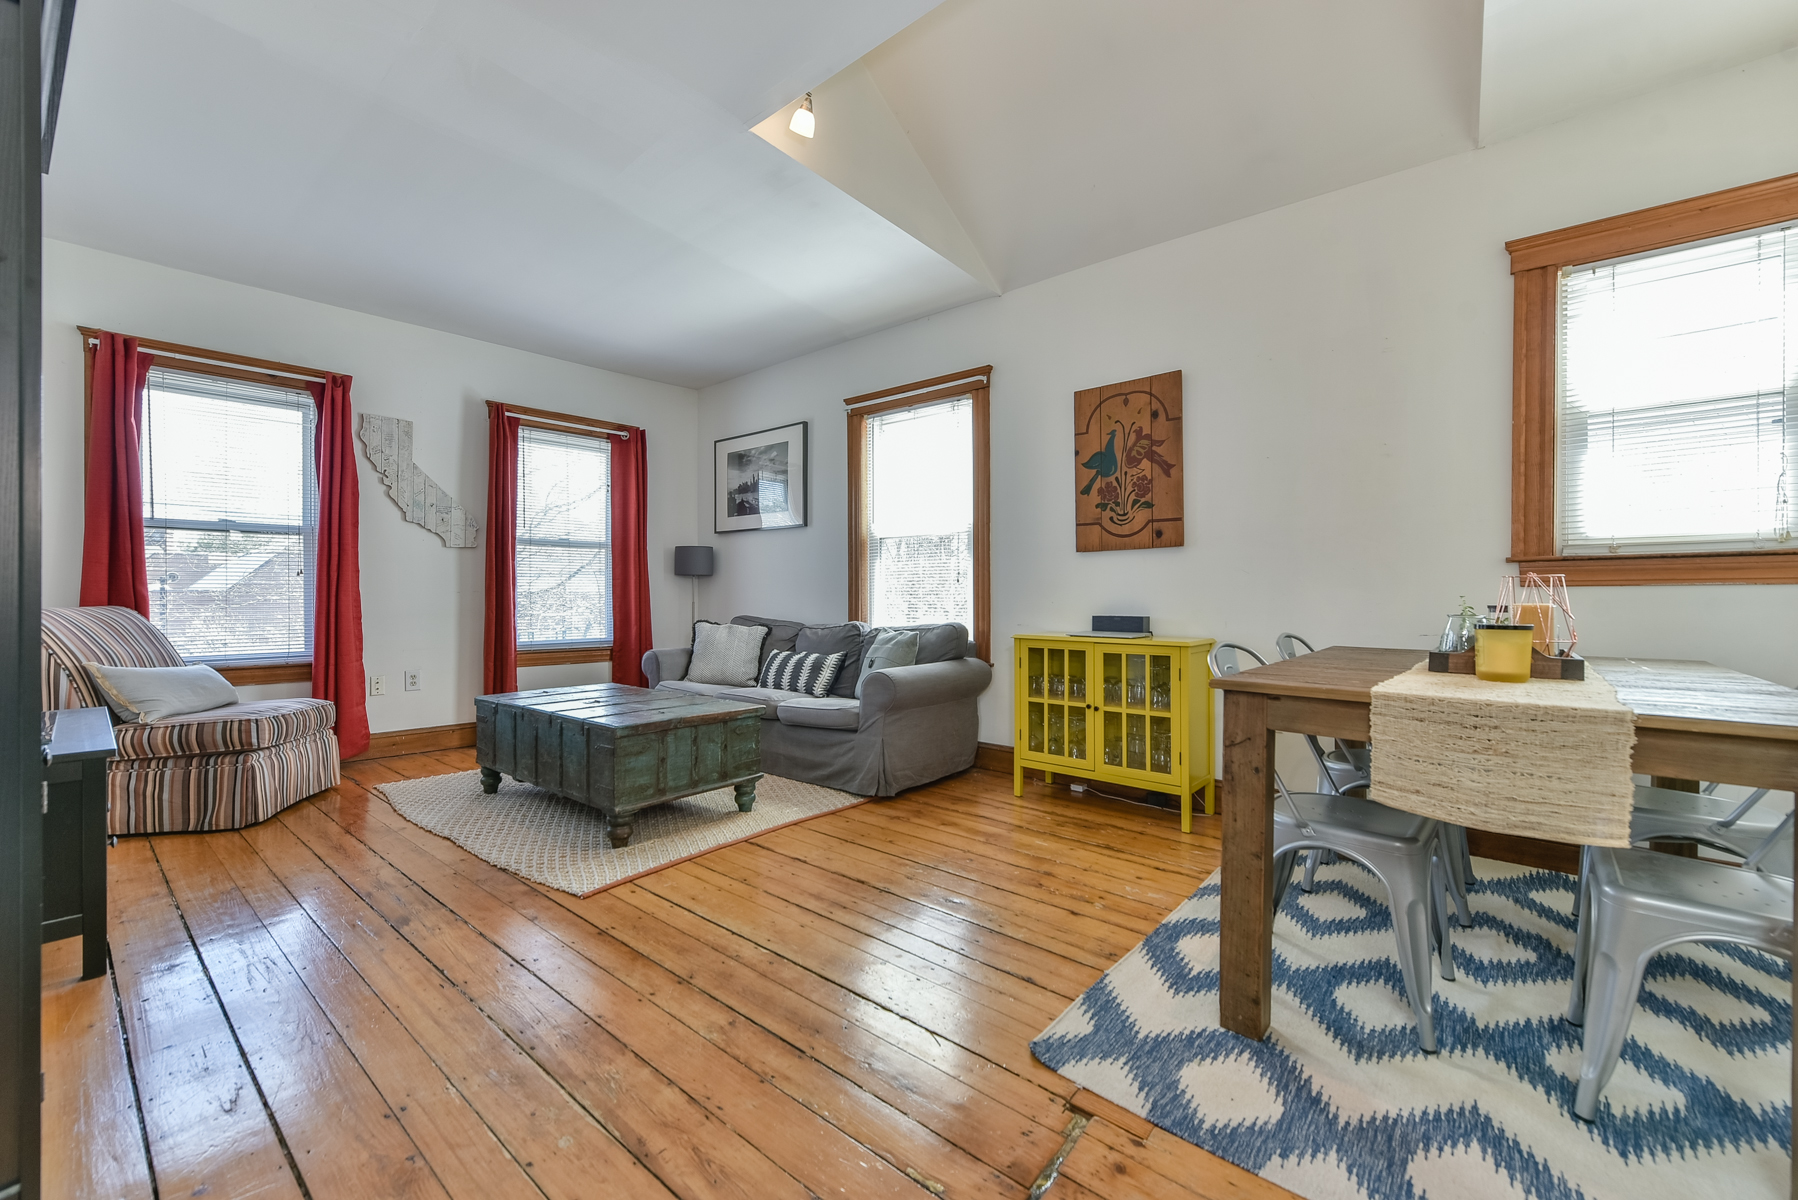 Condominium for Sale at 181 Lamartine St 2, Boston 181 Lamartine St #2 Boston, Massachusetts, 02130 United States